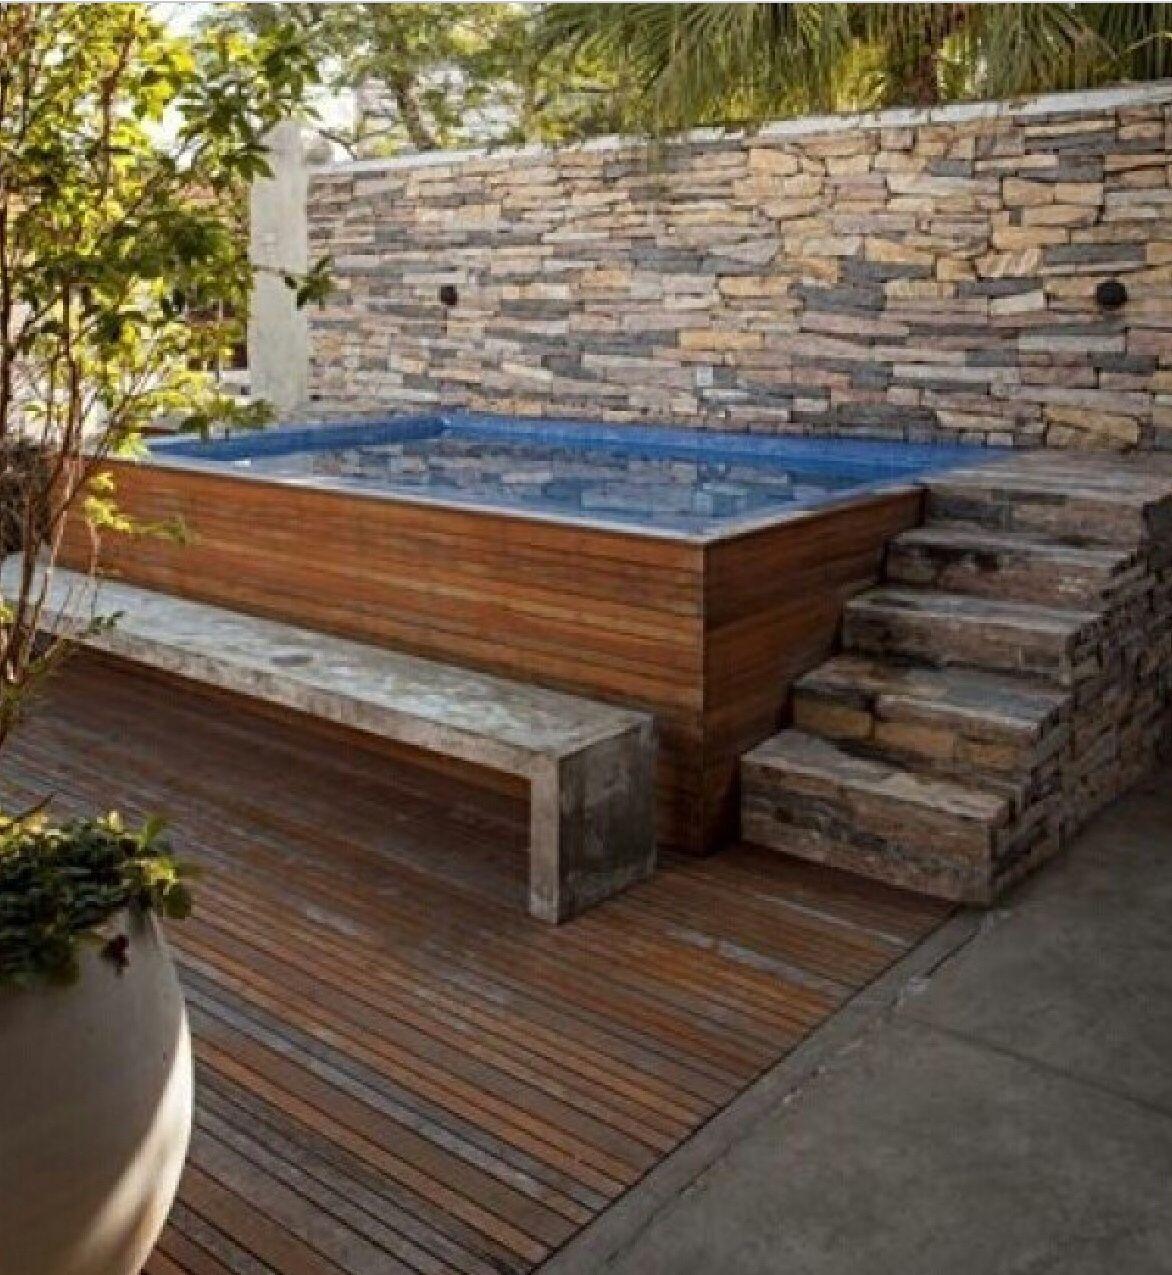 Facebook Hot Tub Backyard Small Backyard Pools Jacuzzi Outdoor